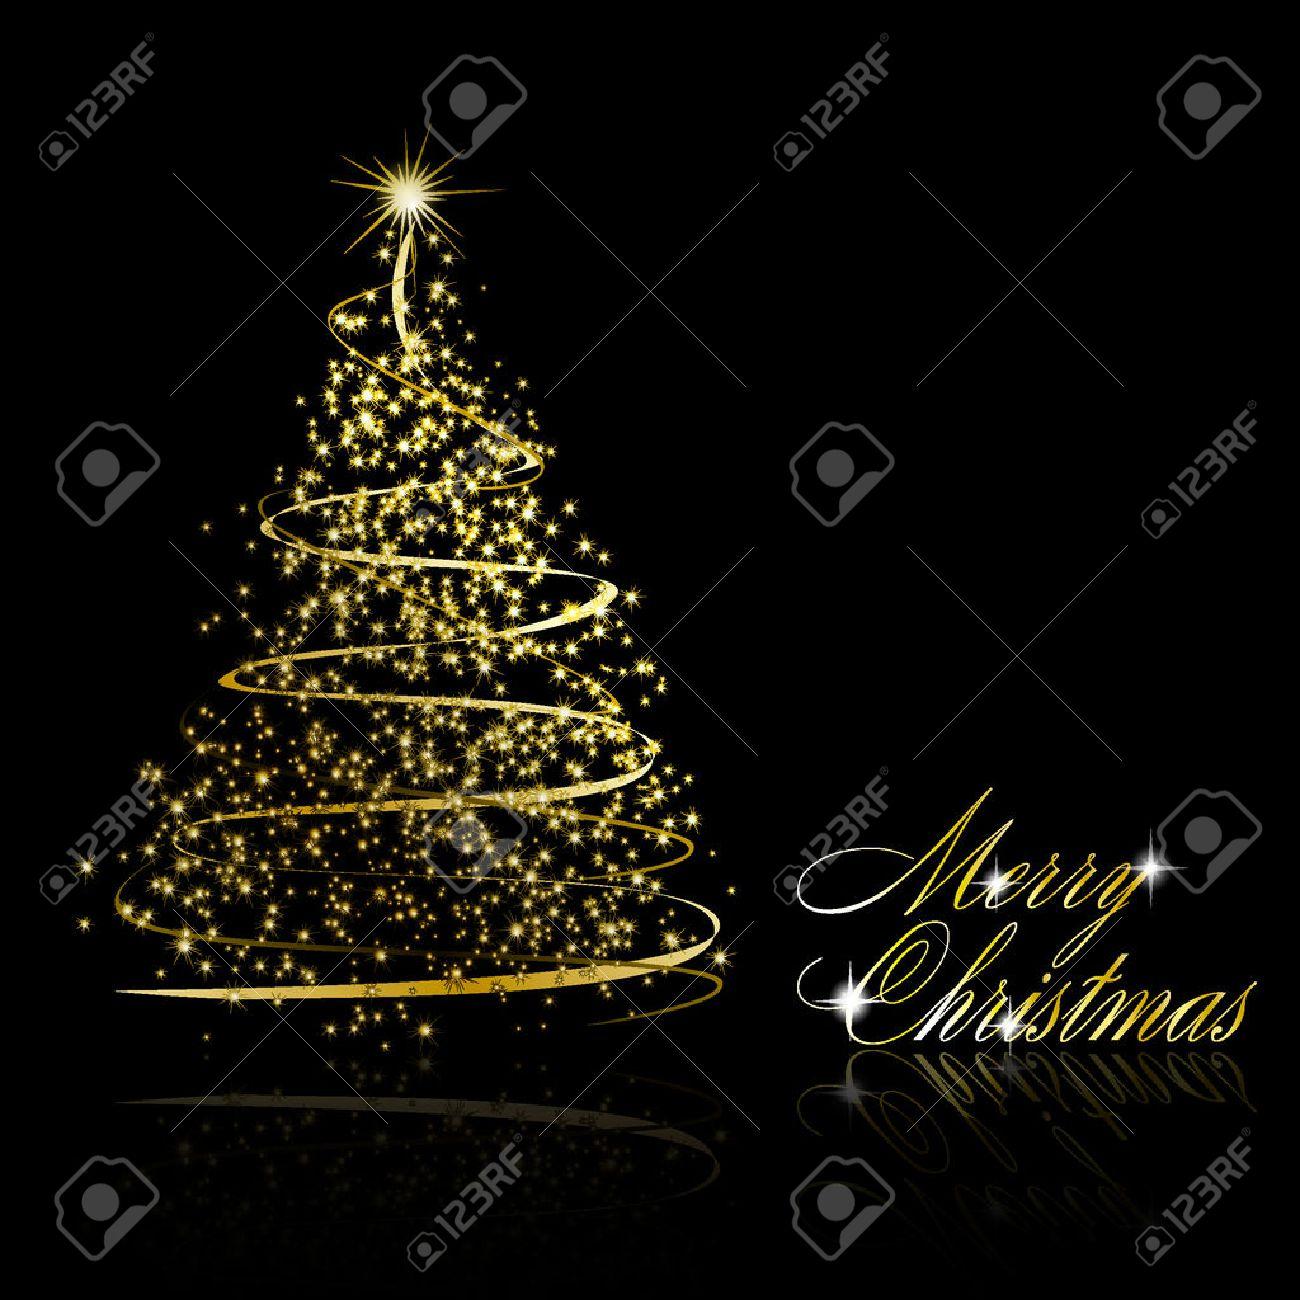 Abstract Golden Christmas Tree On Black Background Illustration